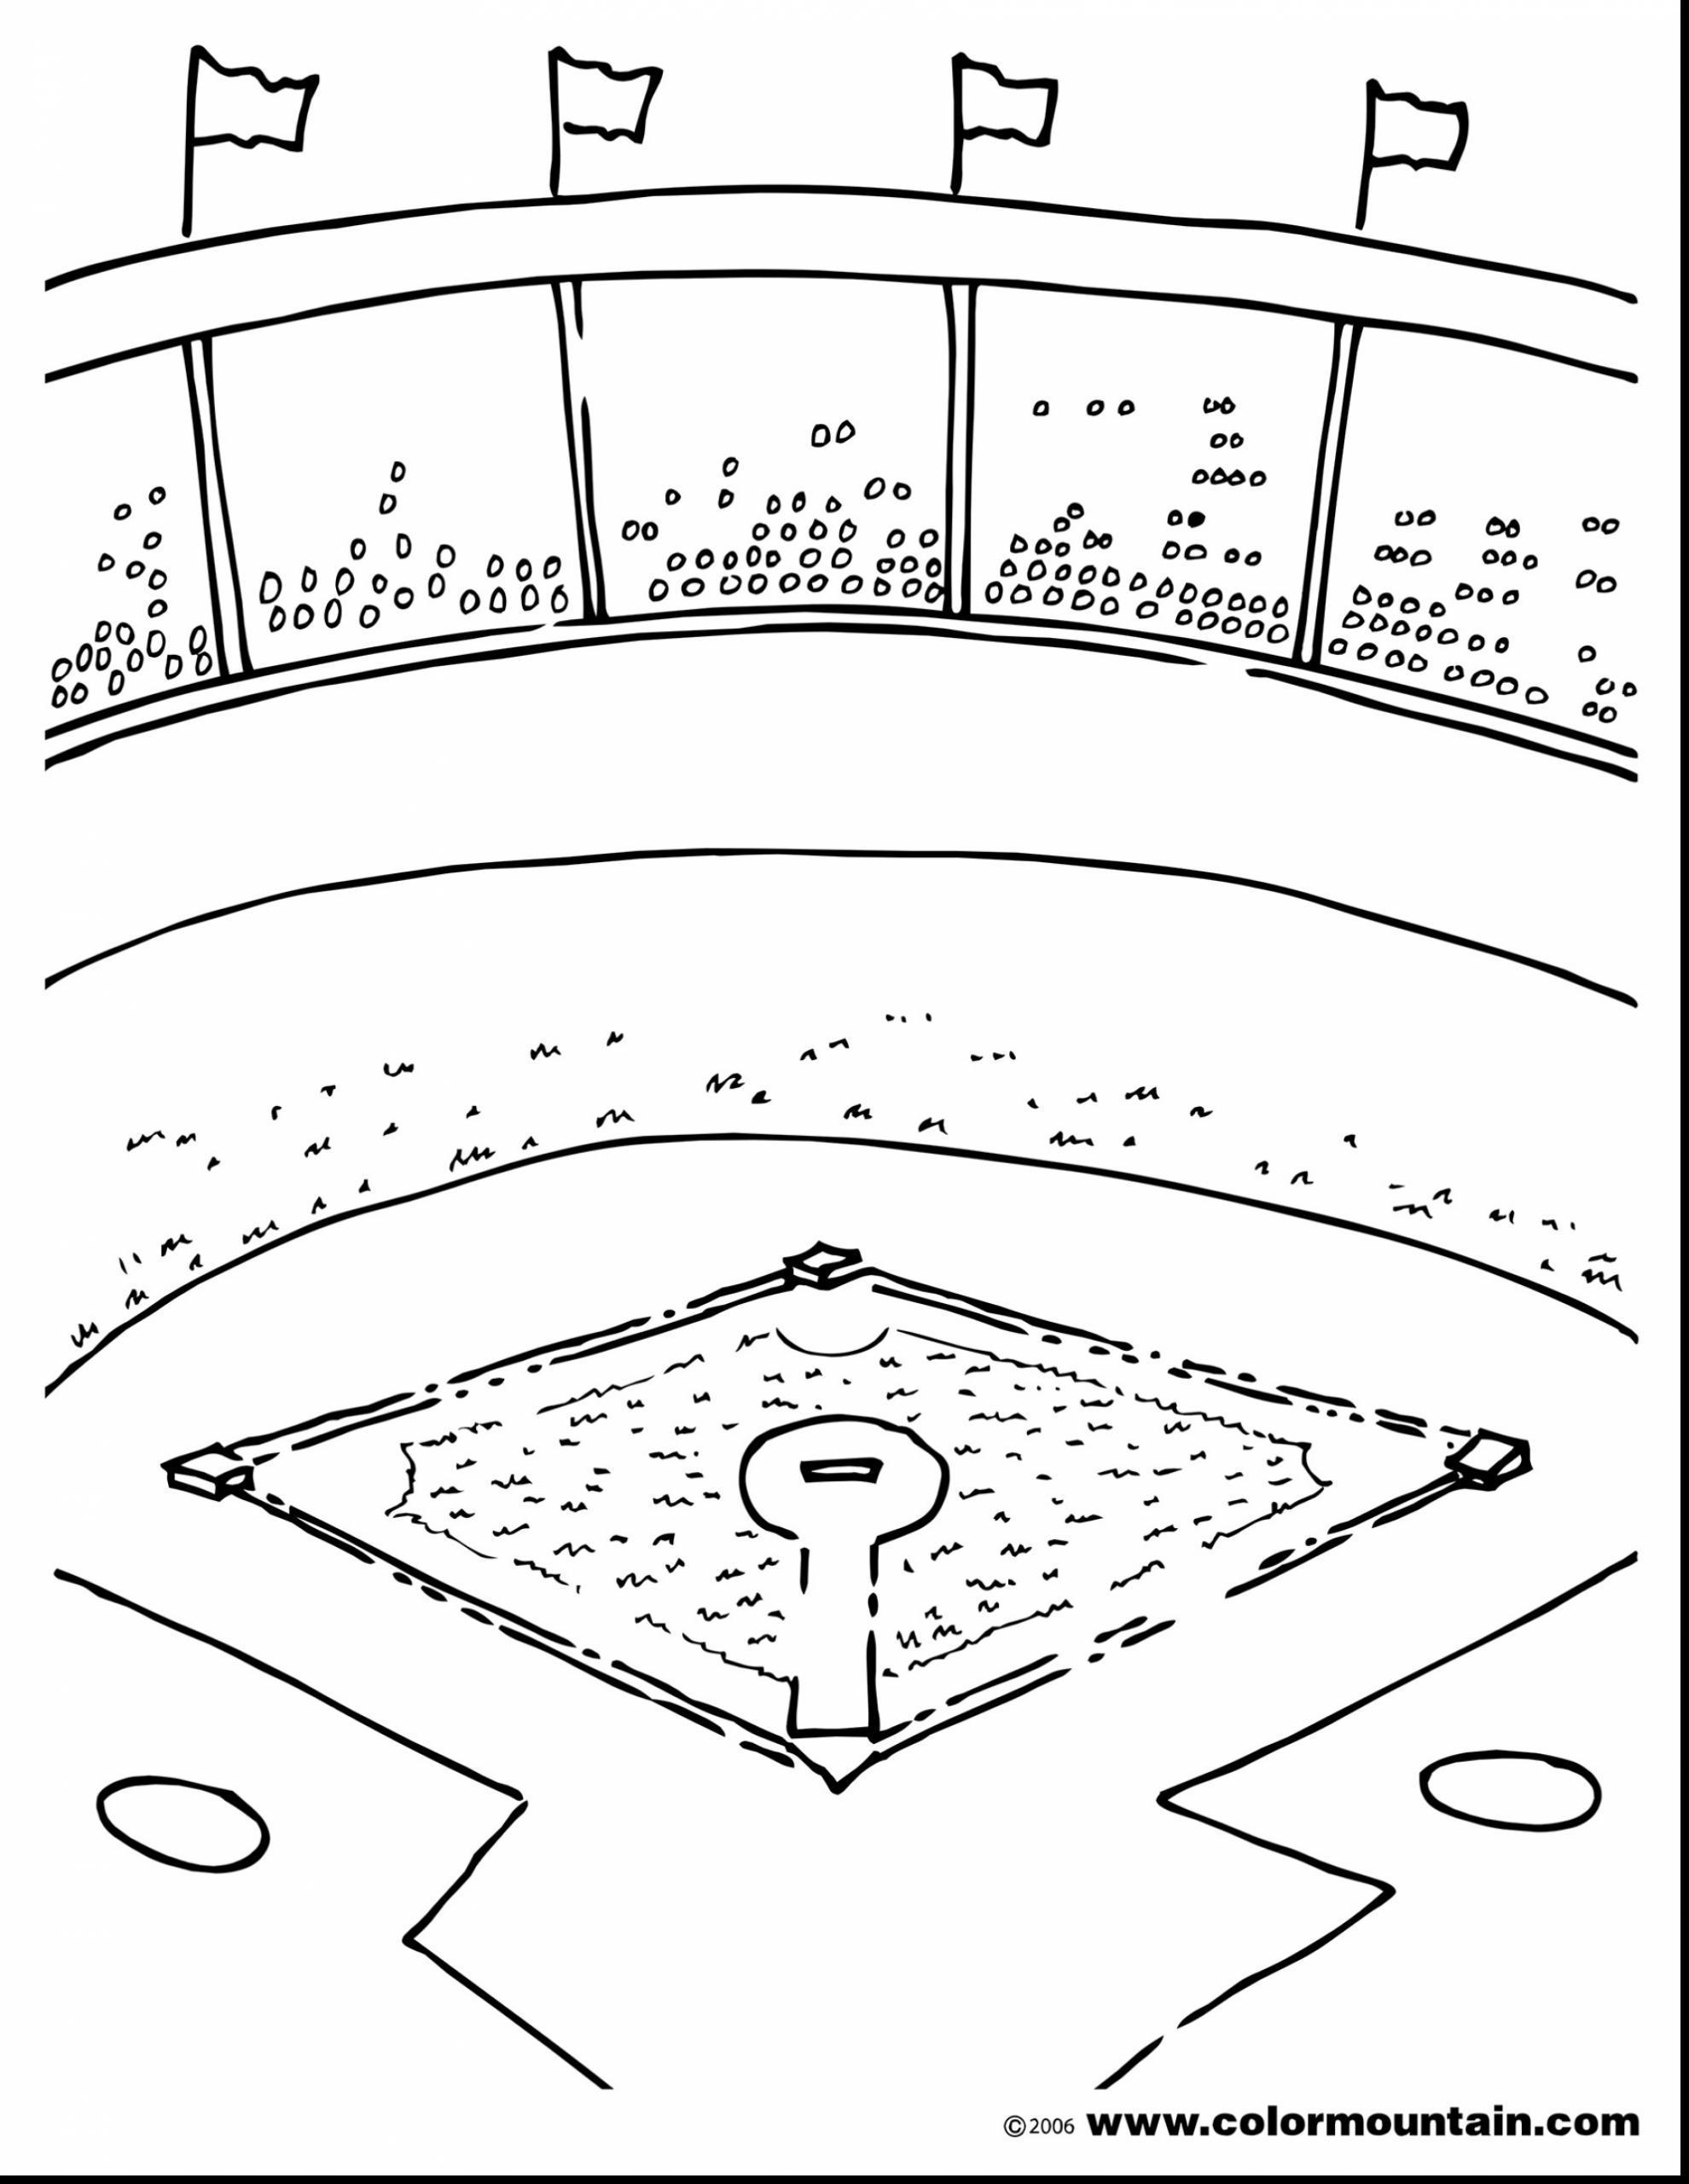 Baseball Schematics